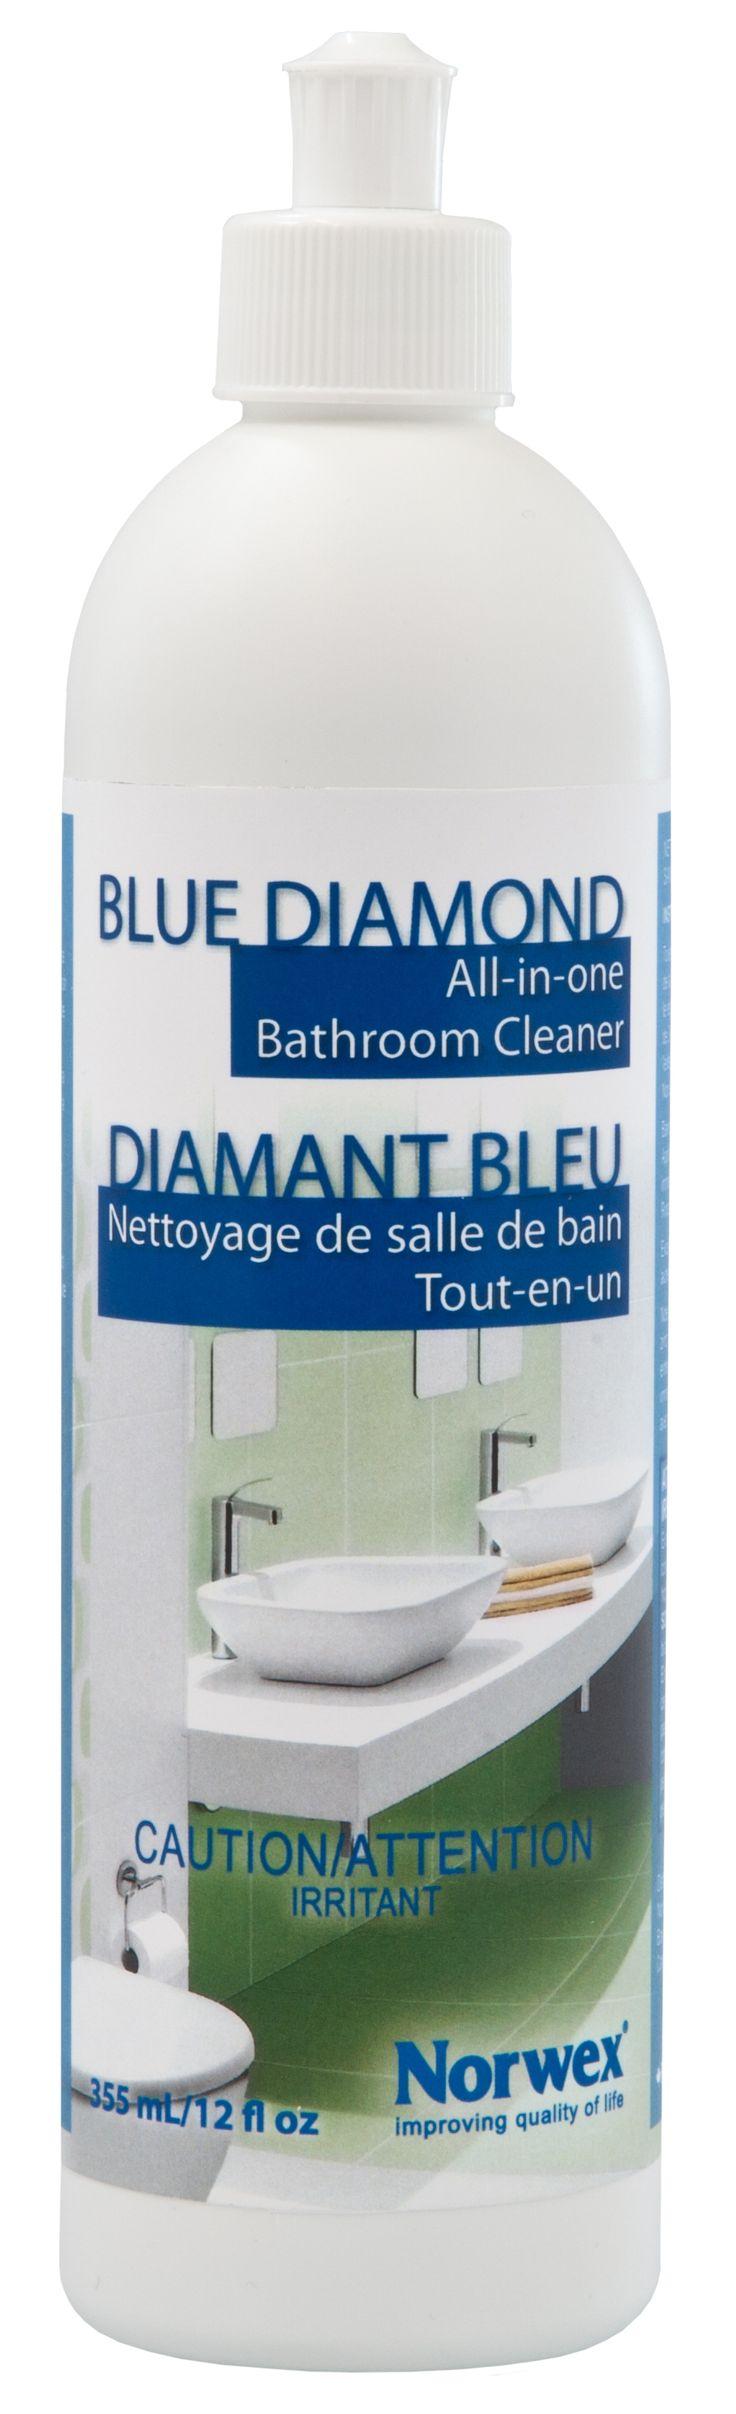 29 best Blue diamond images on Pinterest | Blue diamonds, Norwex ...